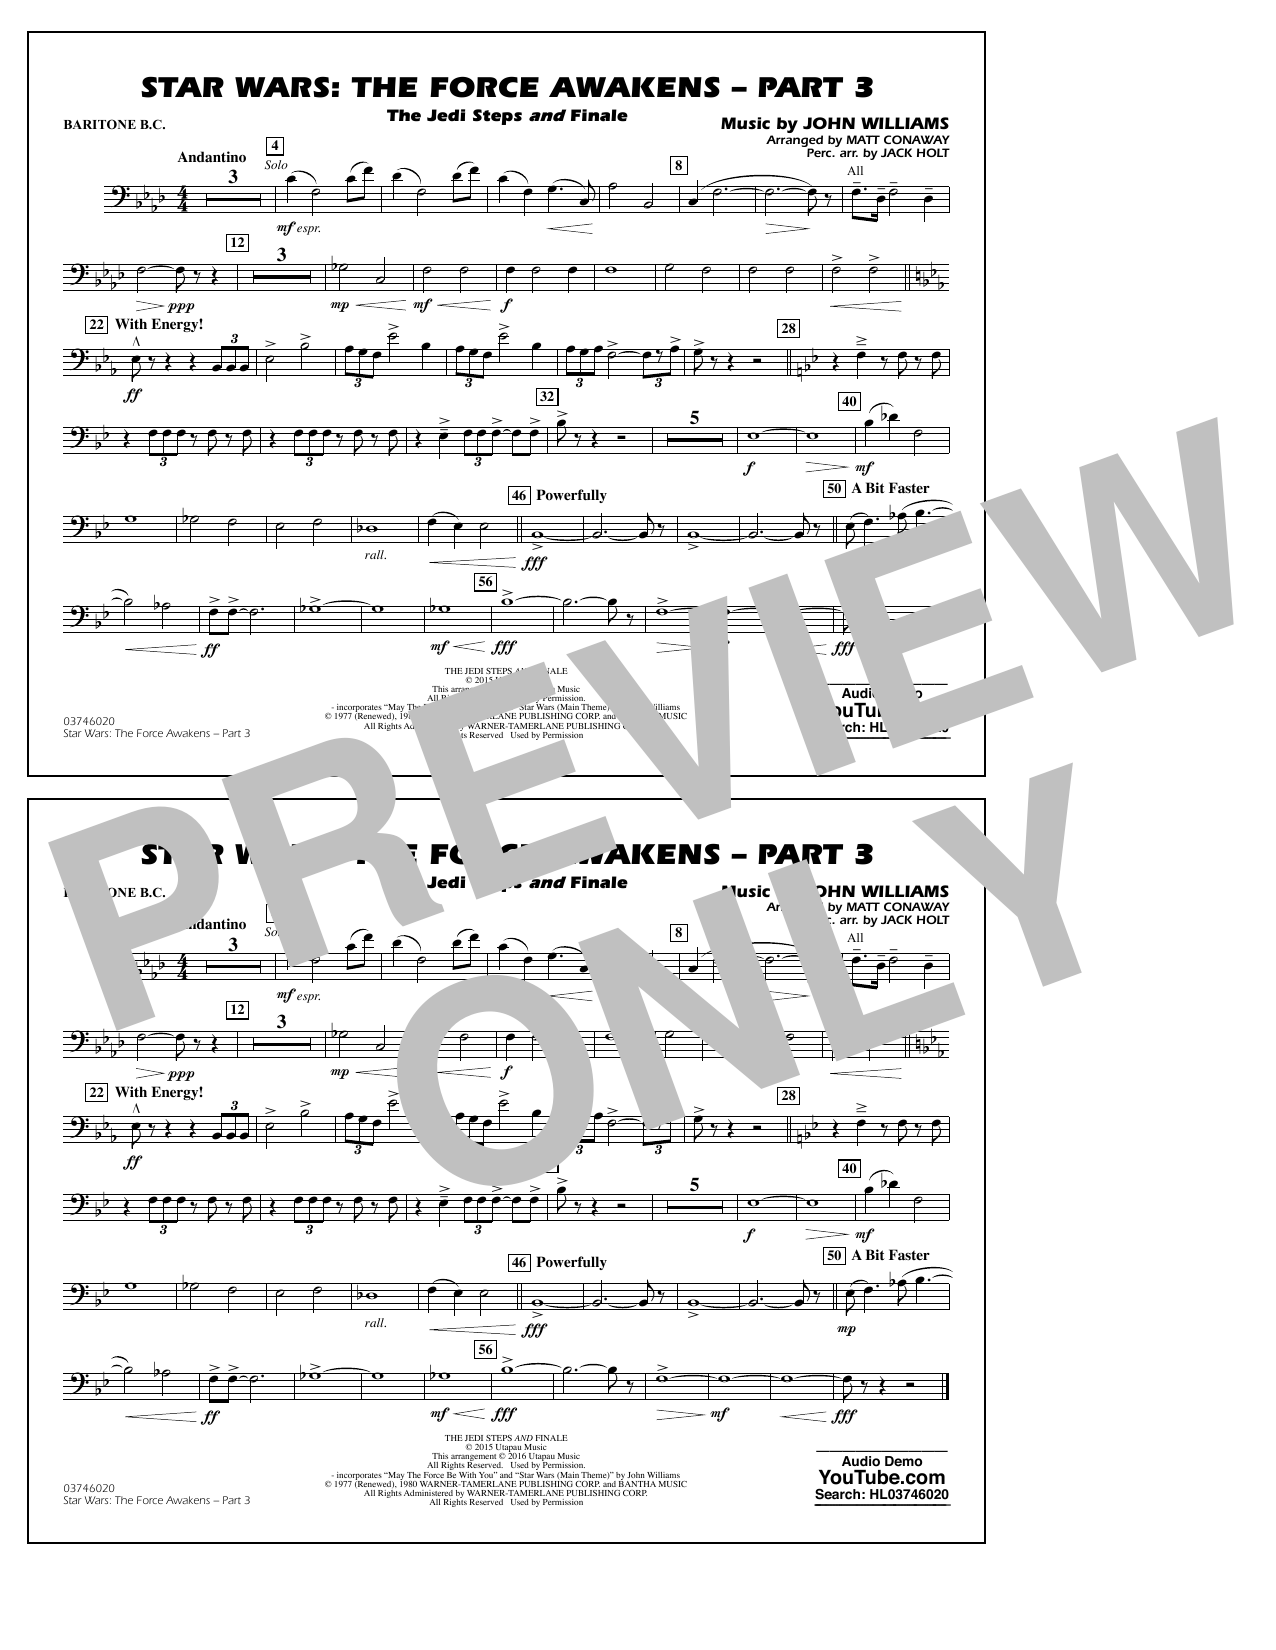 Star Wars: The Force Awakens - Part 3 - Baritone B.C. (Marching Band)